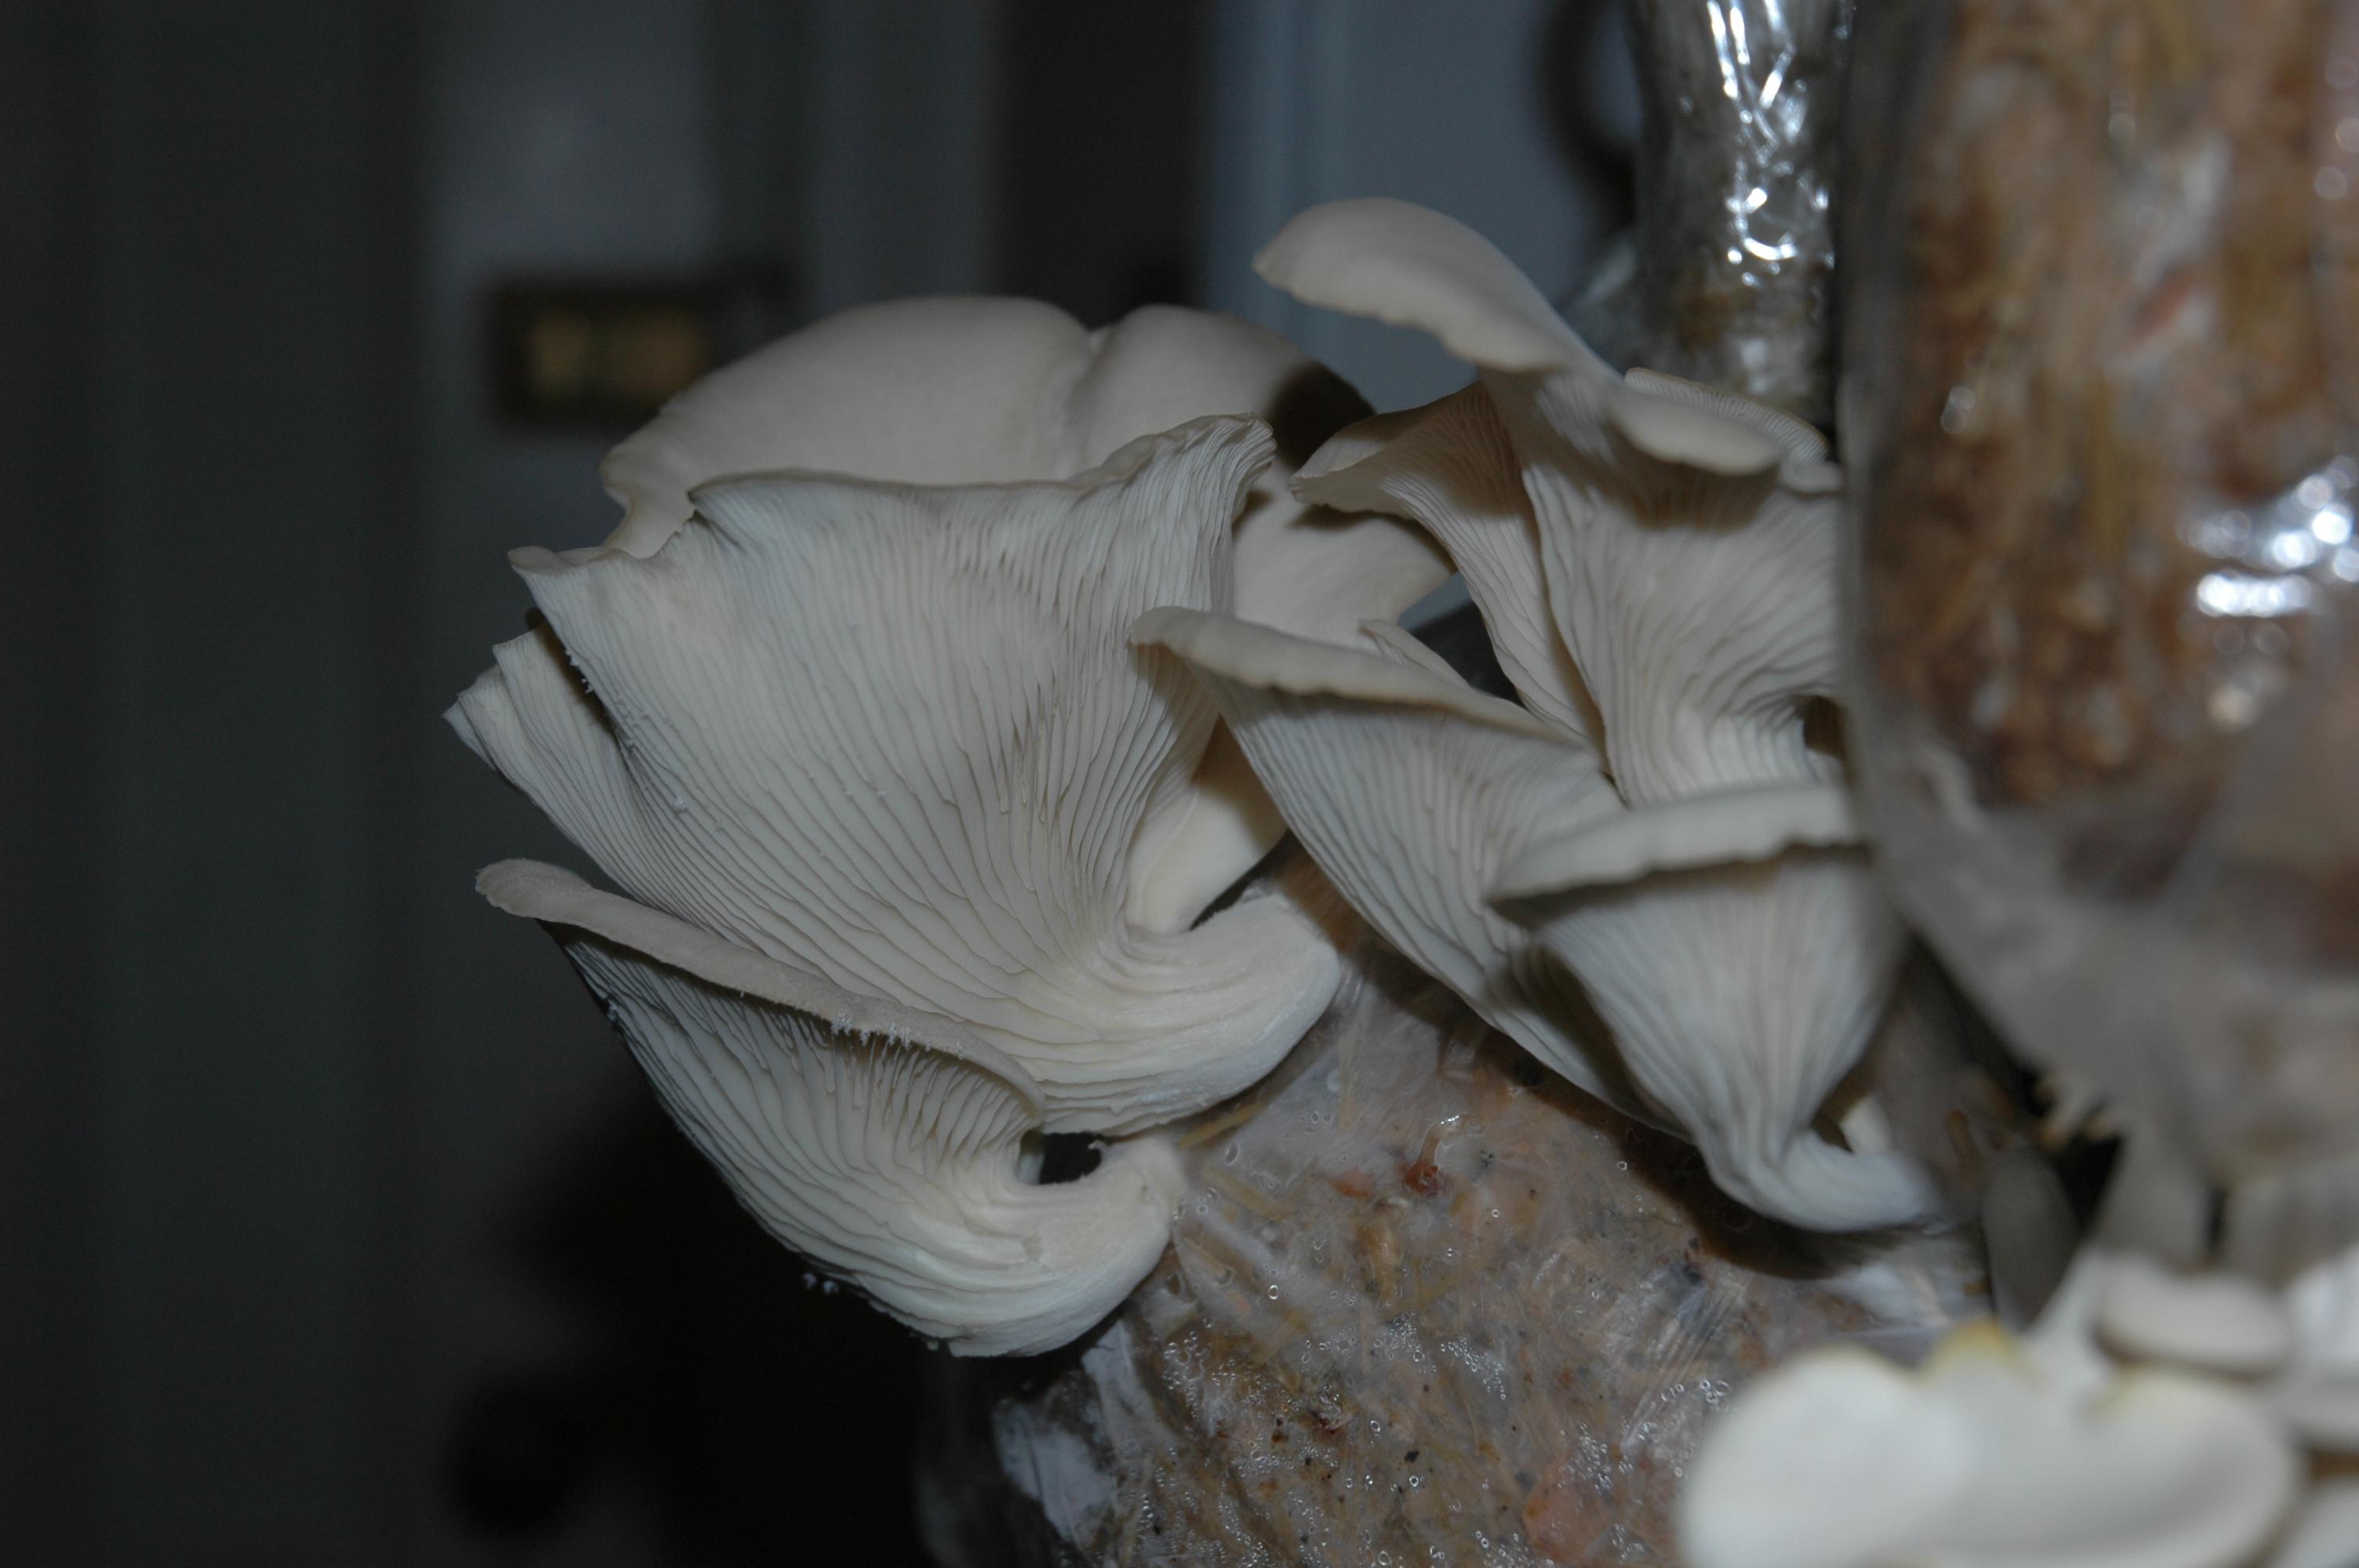 2009-10-10 223